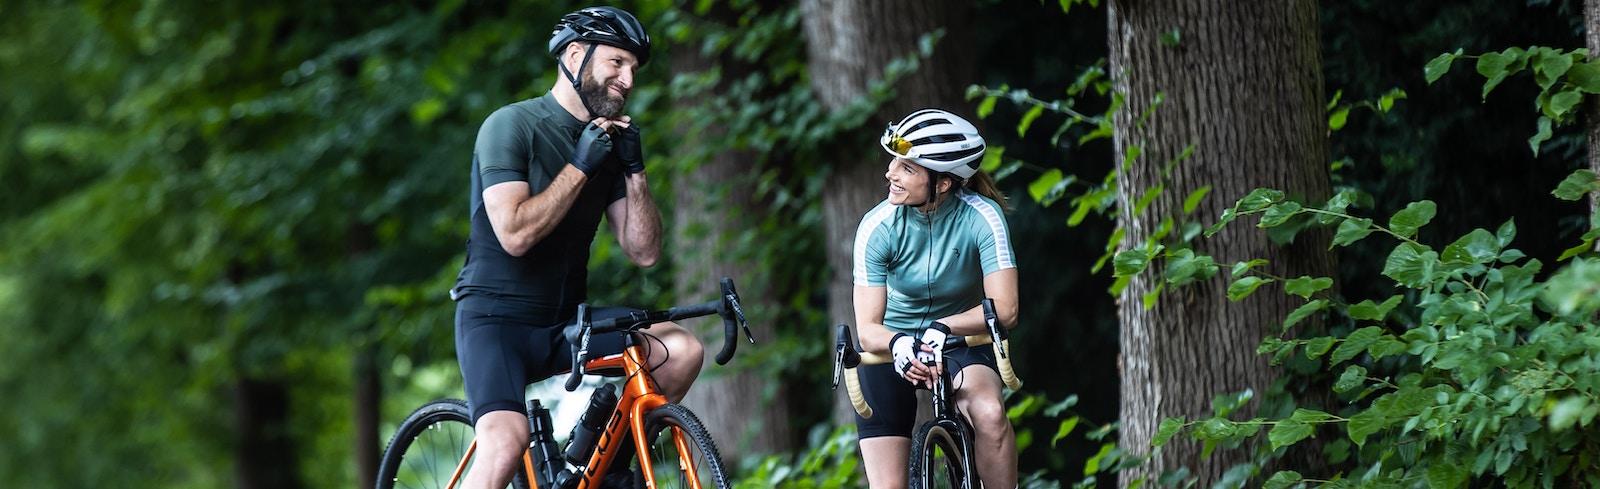 Comfort-cycling helmets